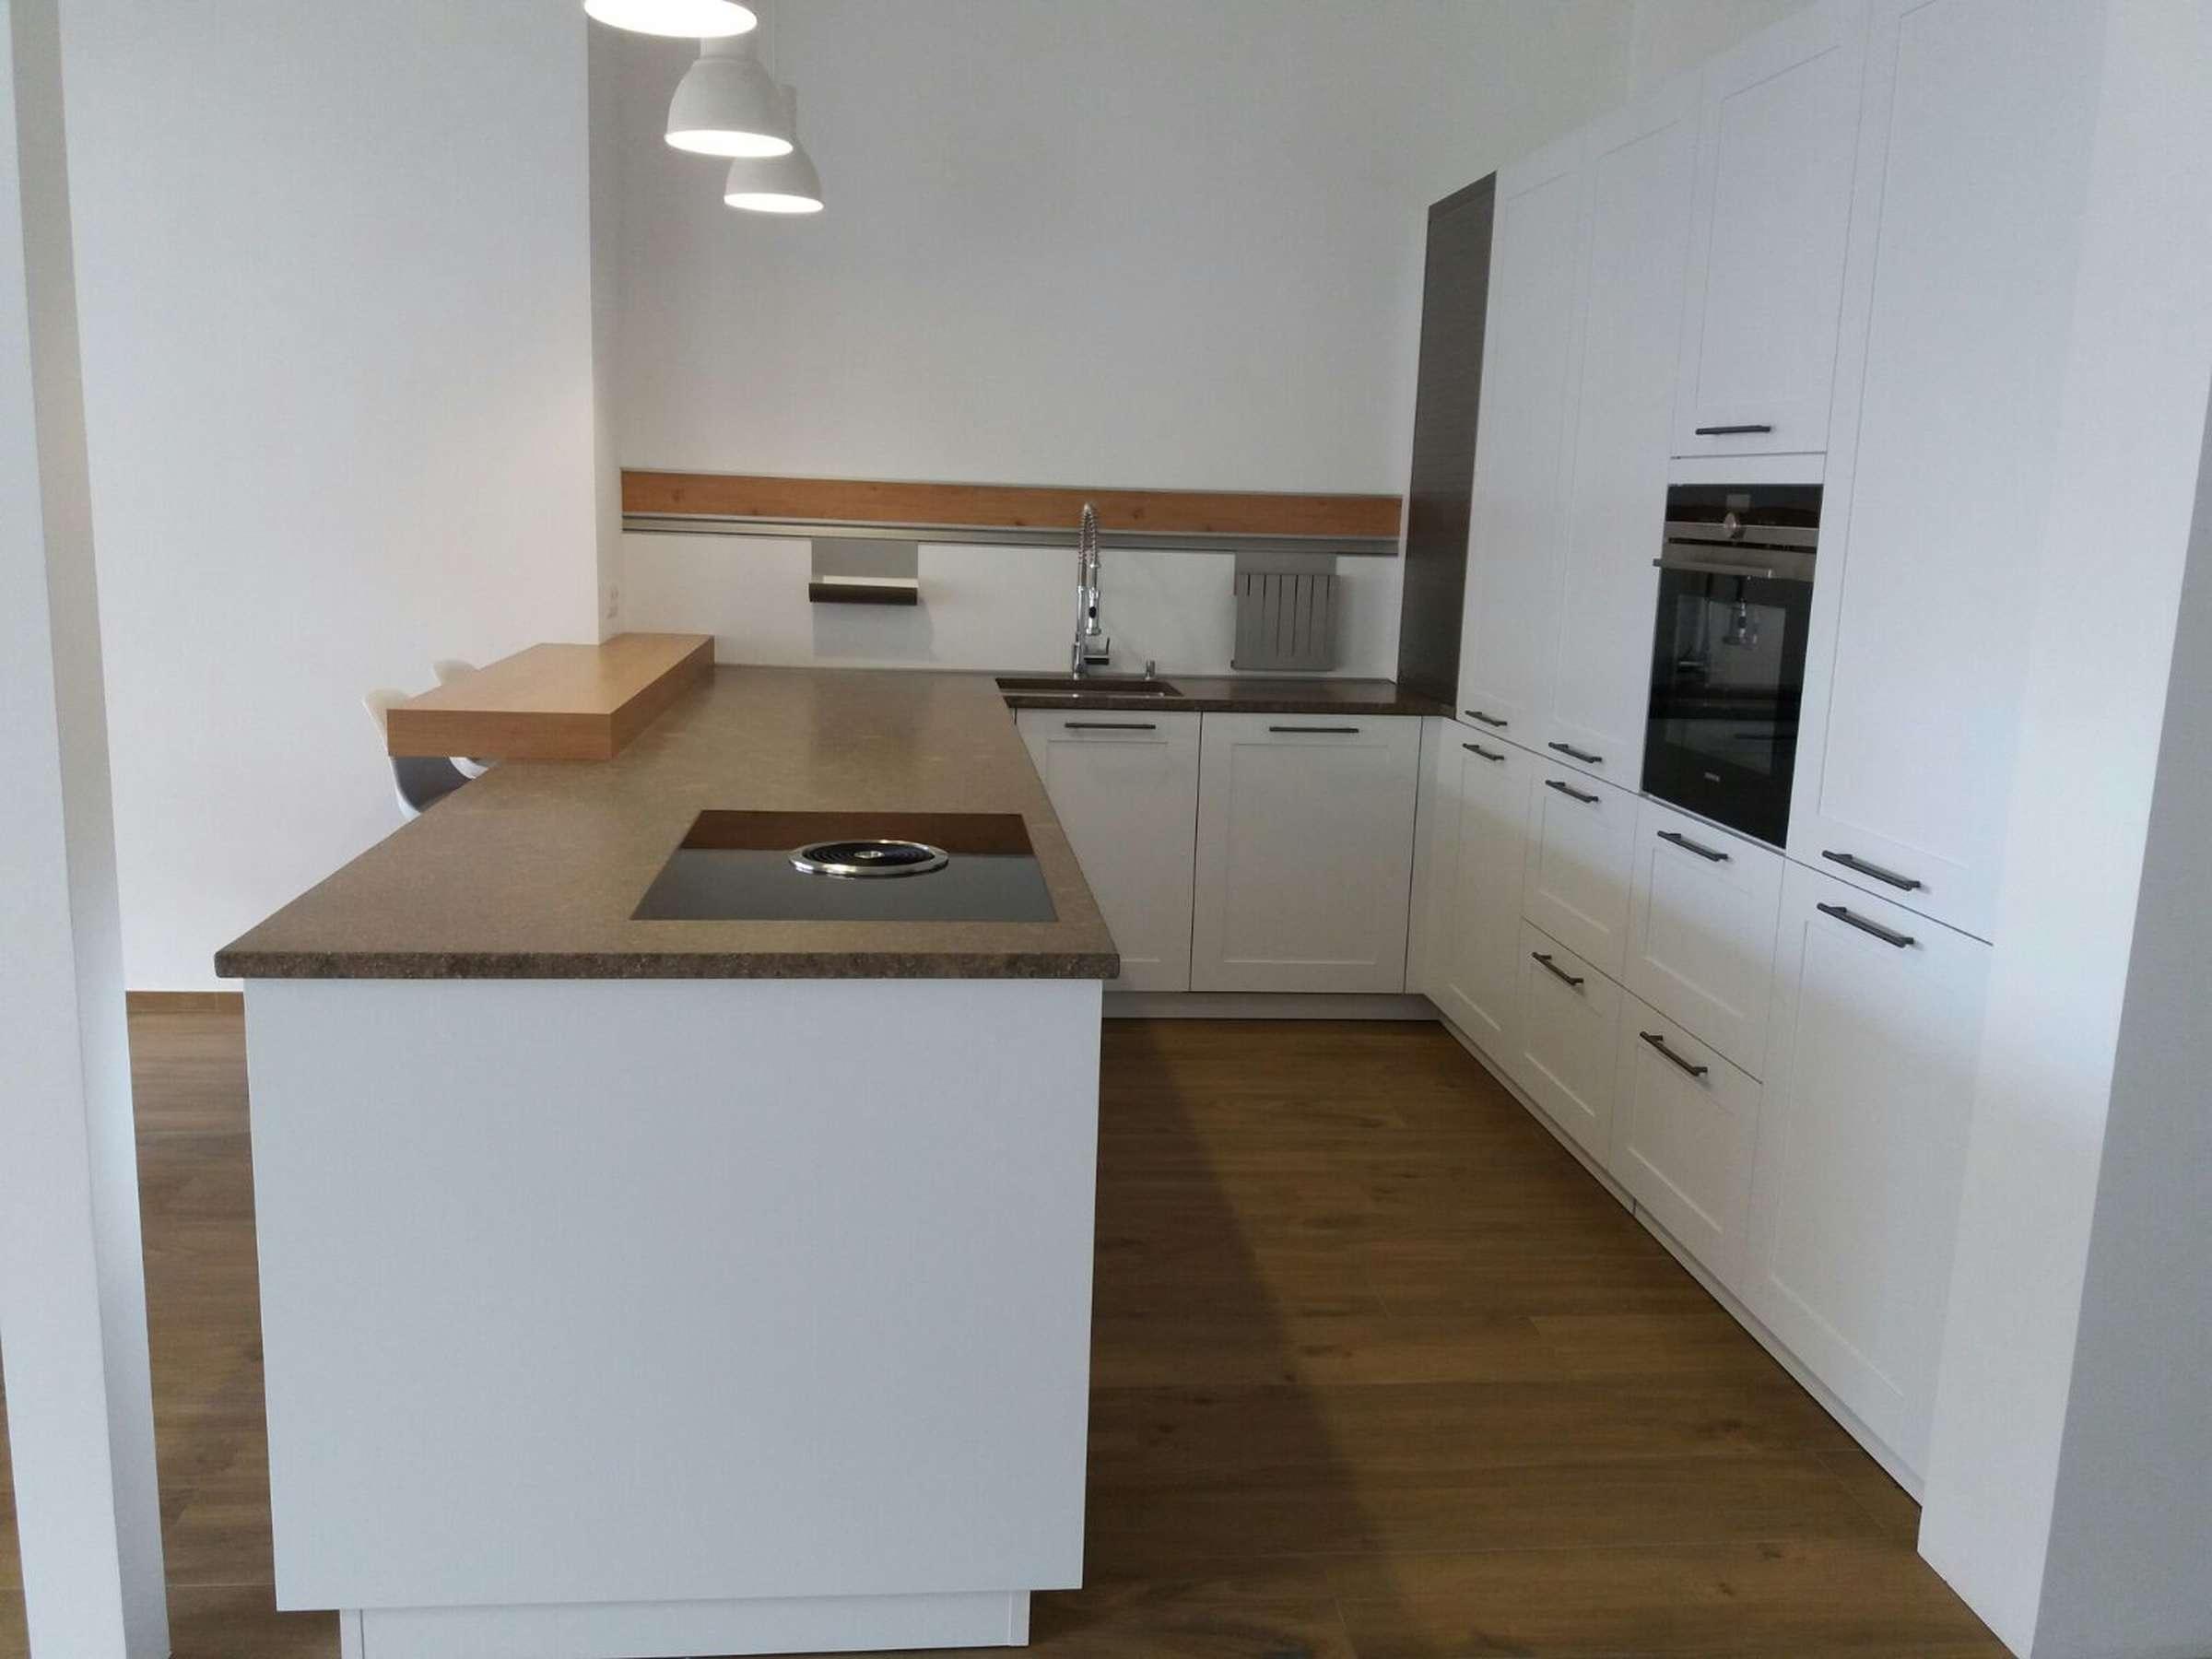 Stunning Häcker Küchen Ausstellung Photos - Farbideen fürs ...